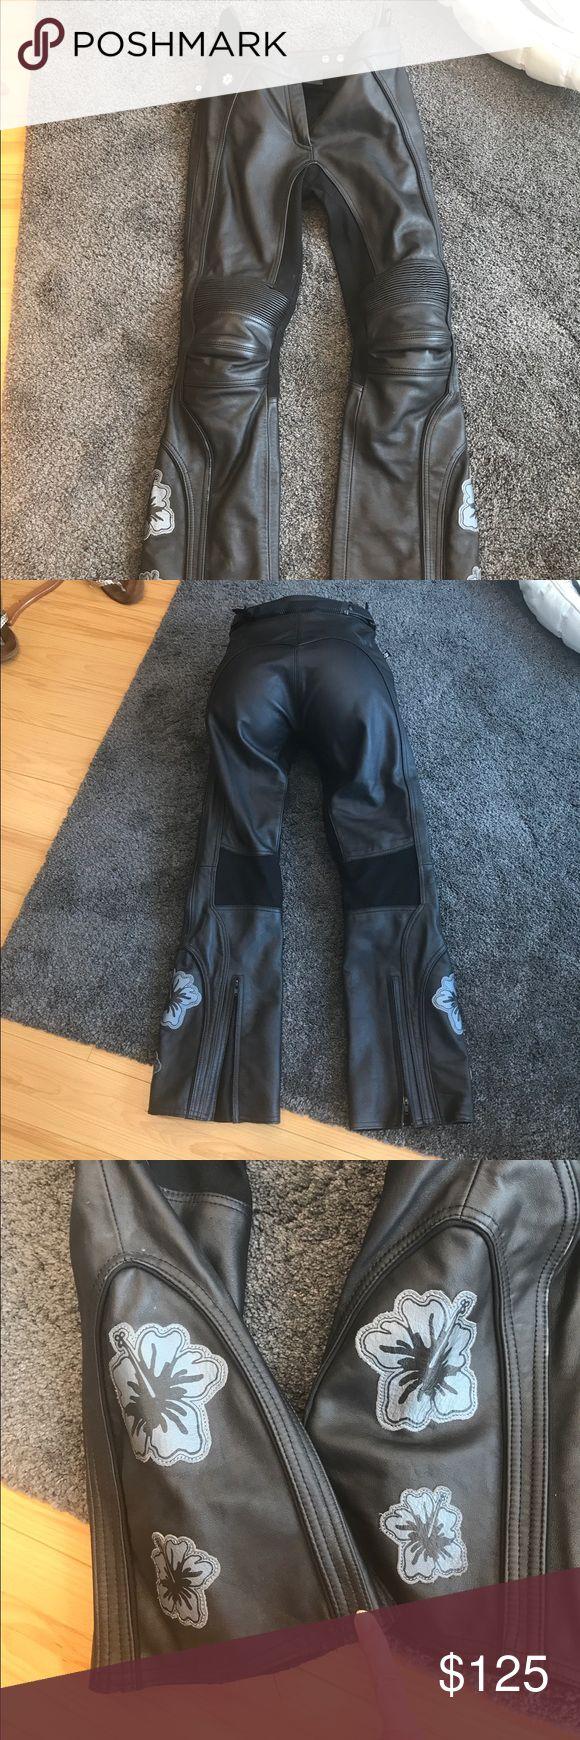 Black, Joe Rocket leather motorcycle pants. XS. Only worn a few times. Black Joe Rocket leather motorcycle pants. Joe Rocket Pants